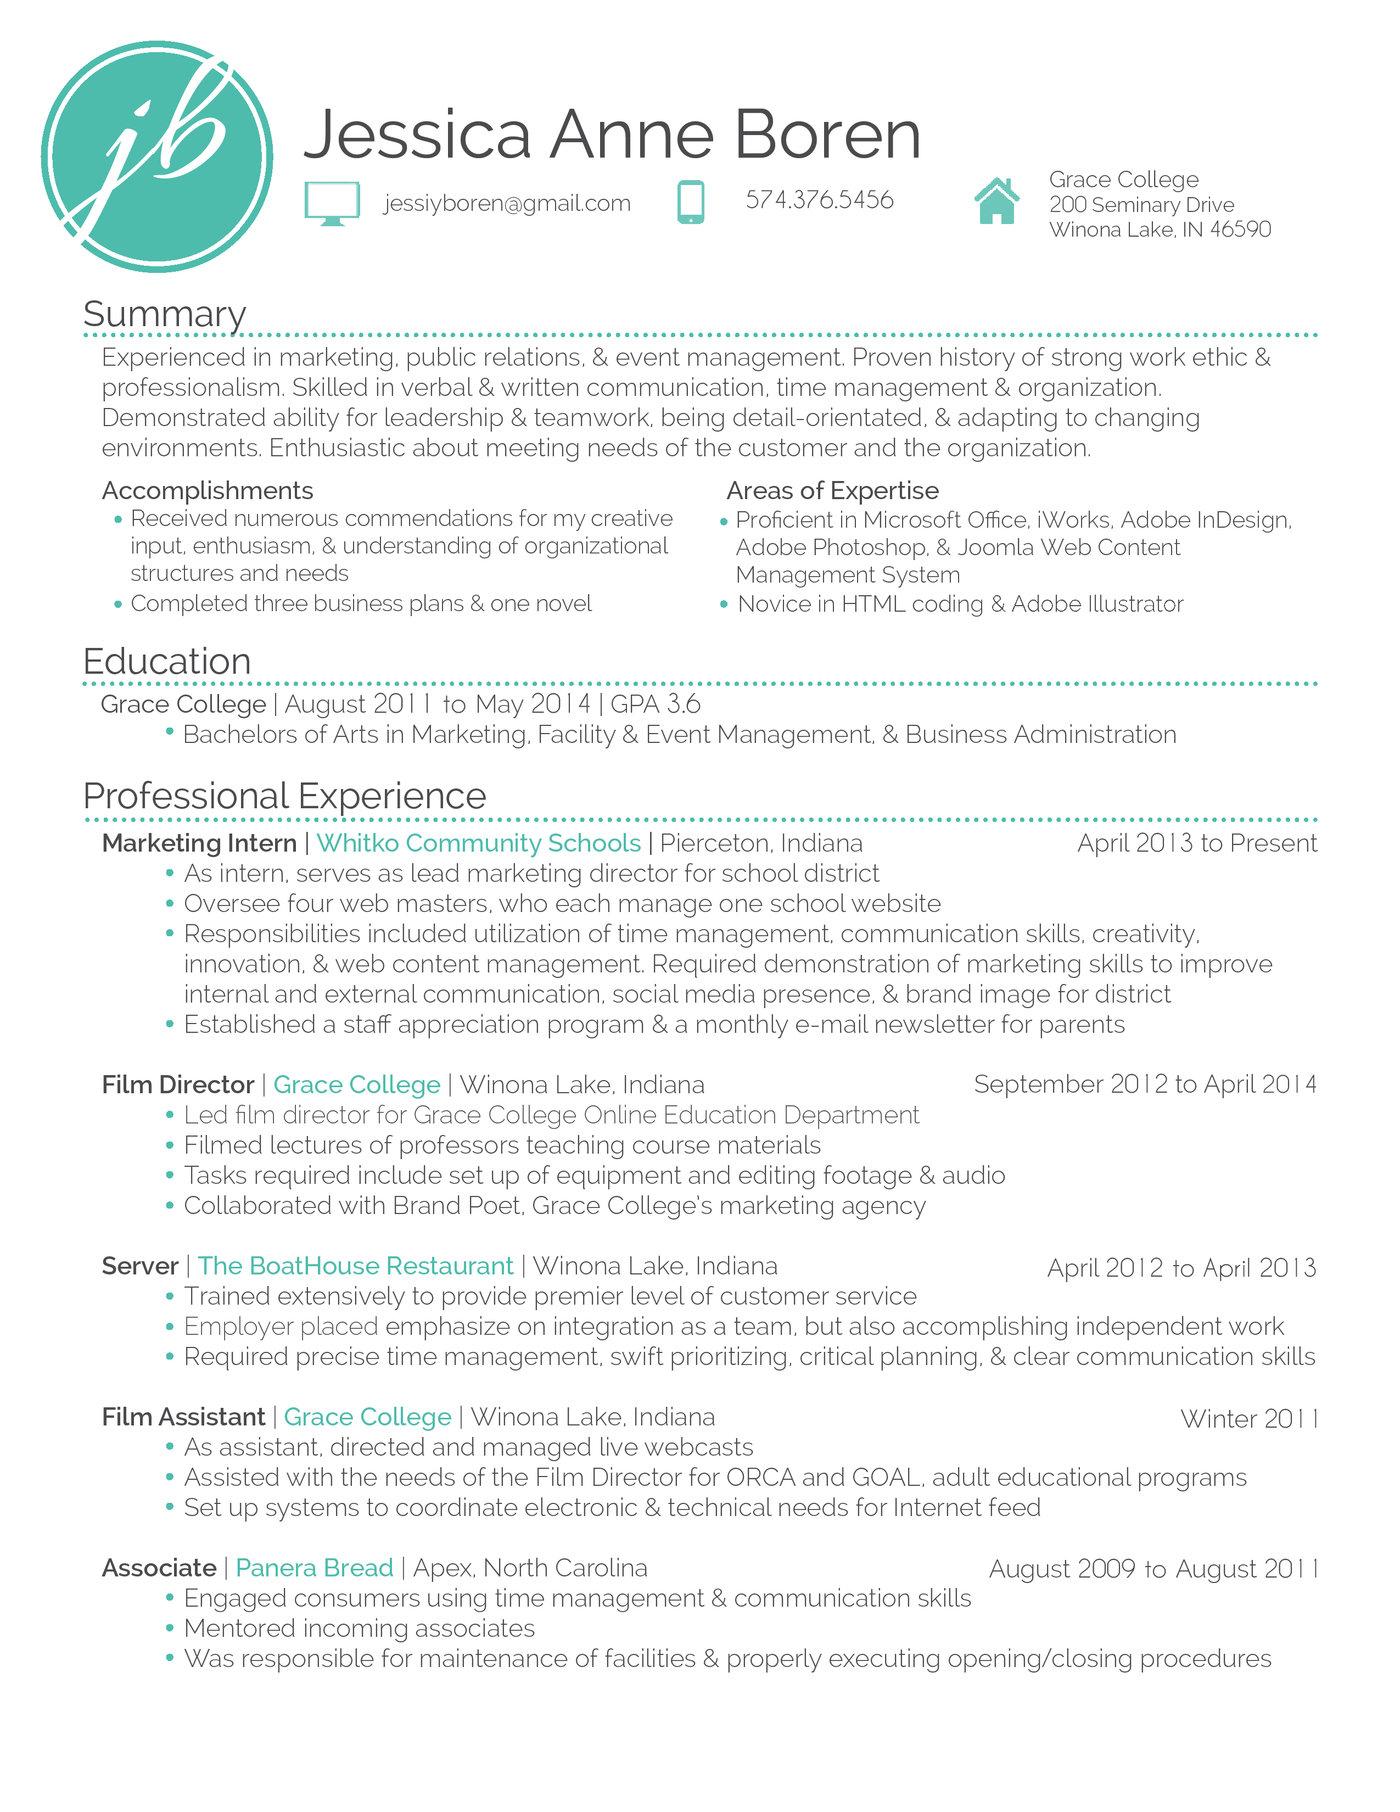 My Resume By Jessica Anne Boren At Coroflot